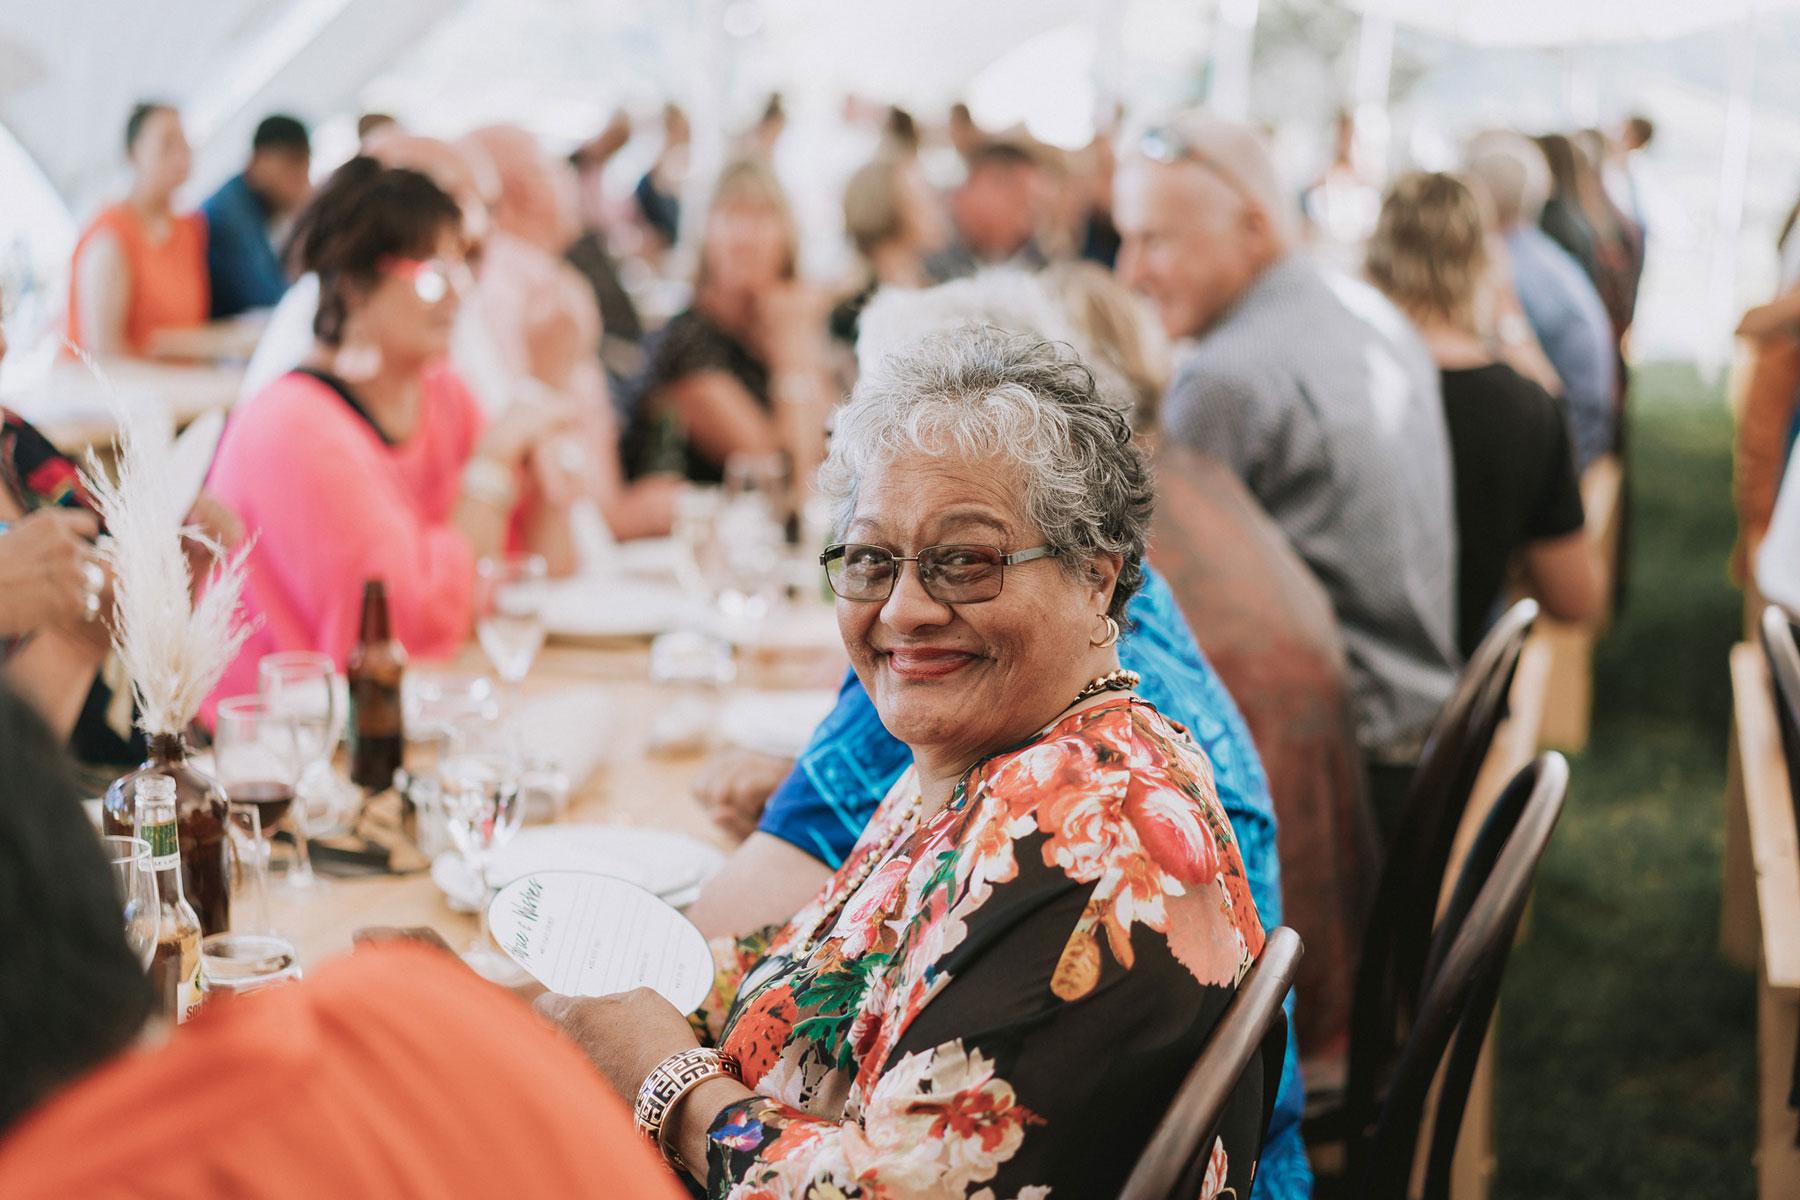 newfound-j-n-orua-beach-house-coromandel-wedding-photographers-606